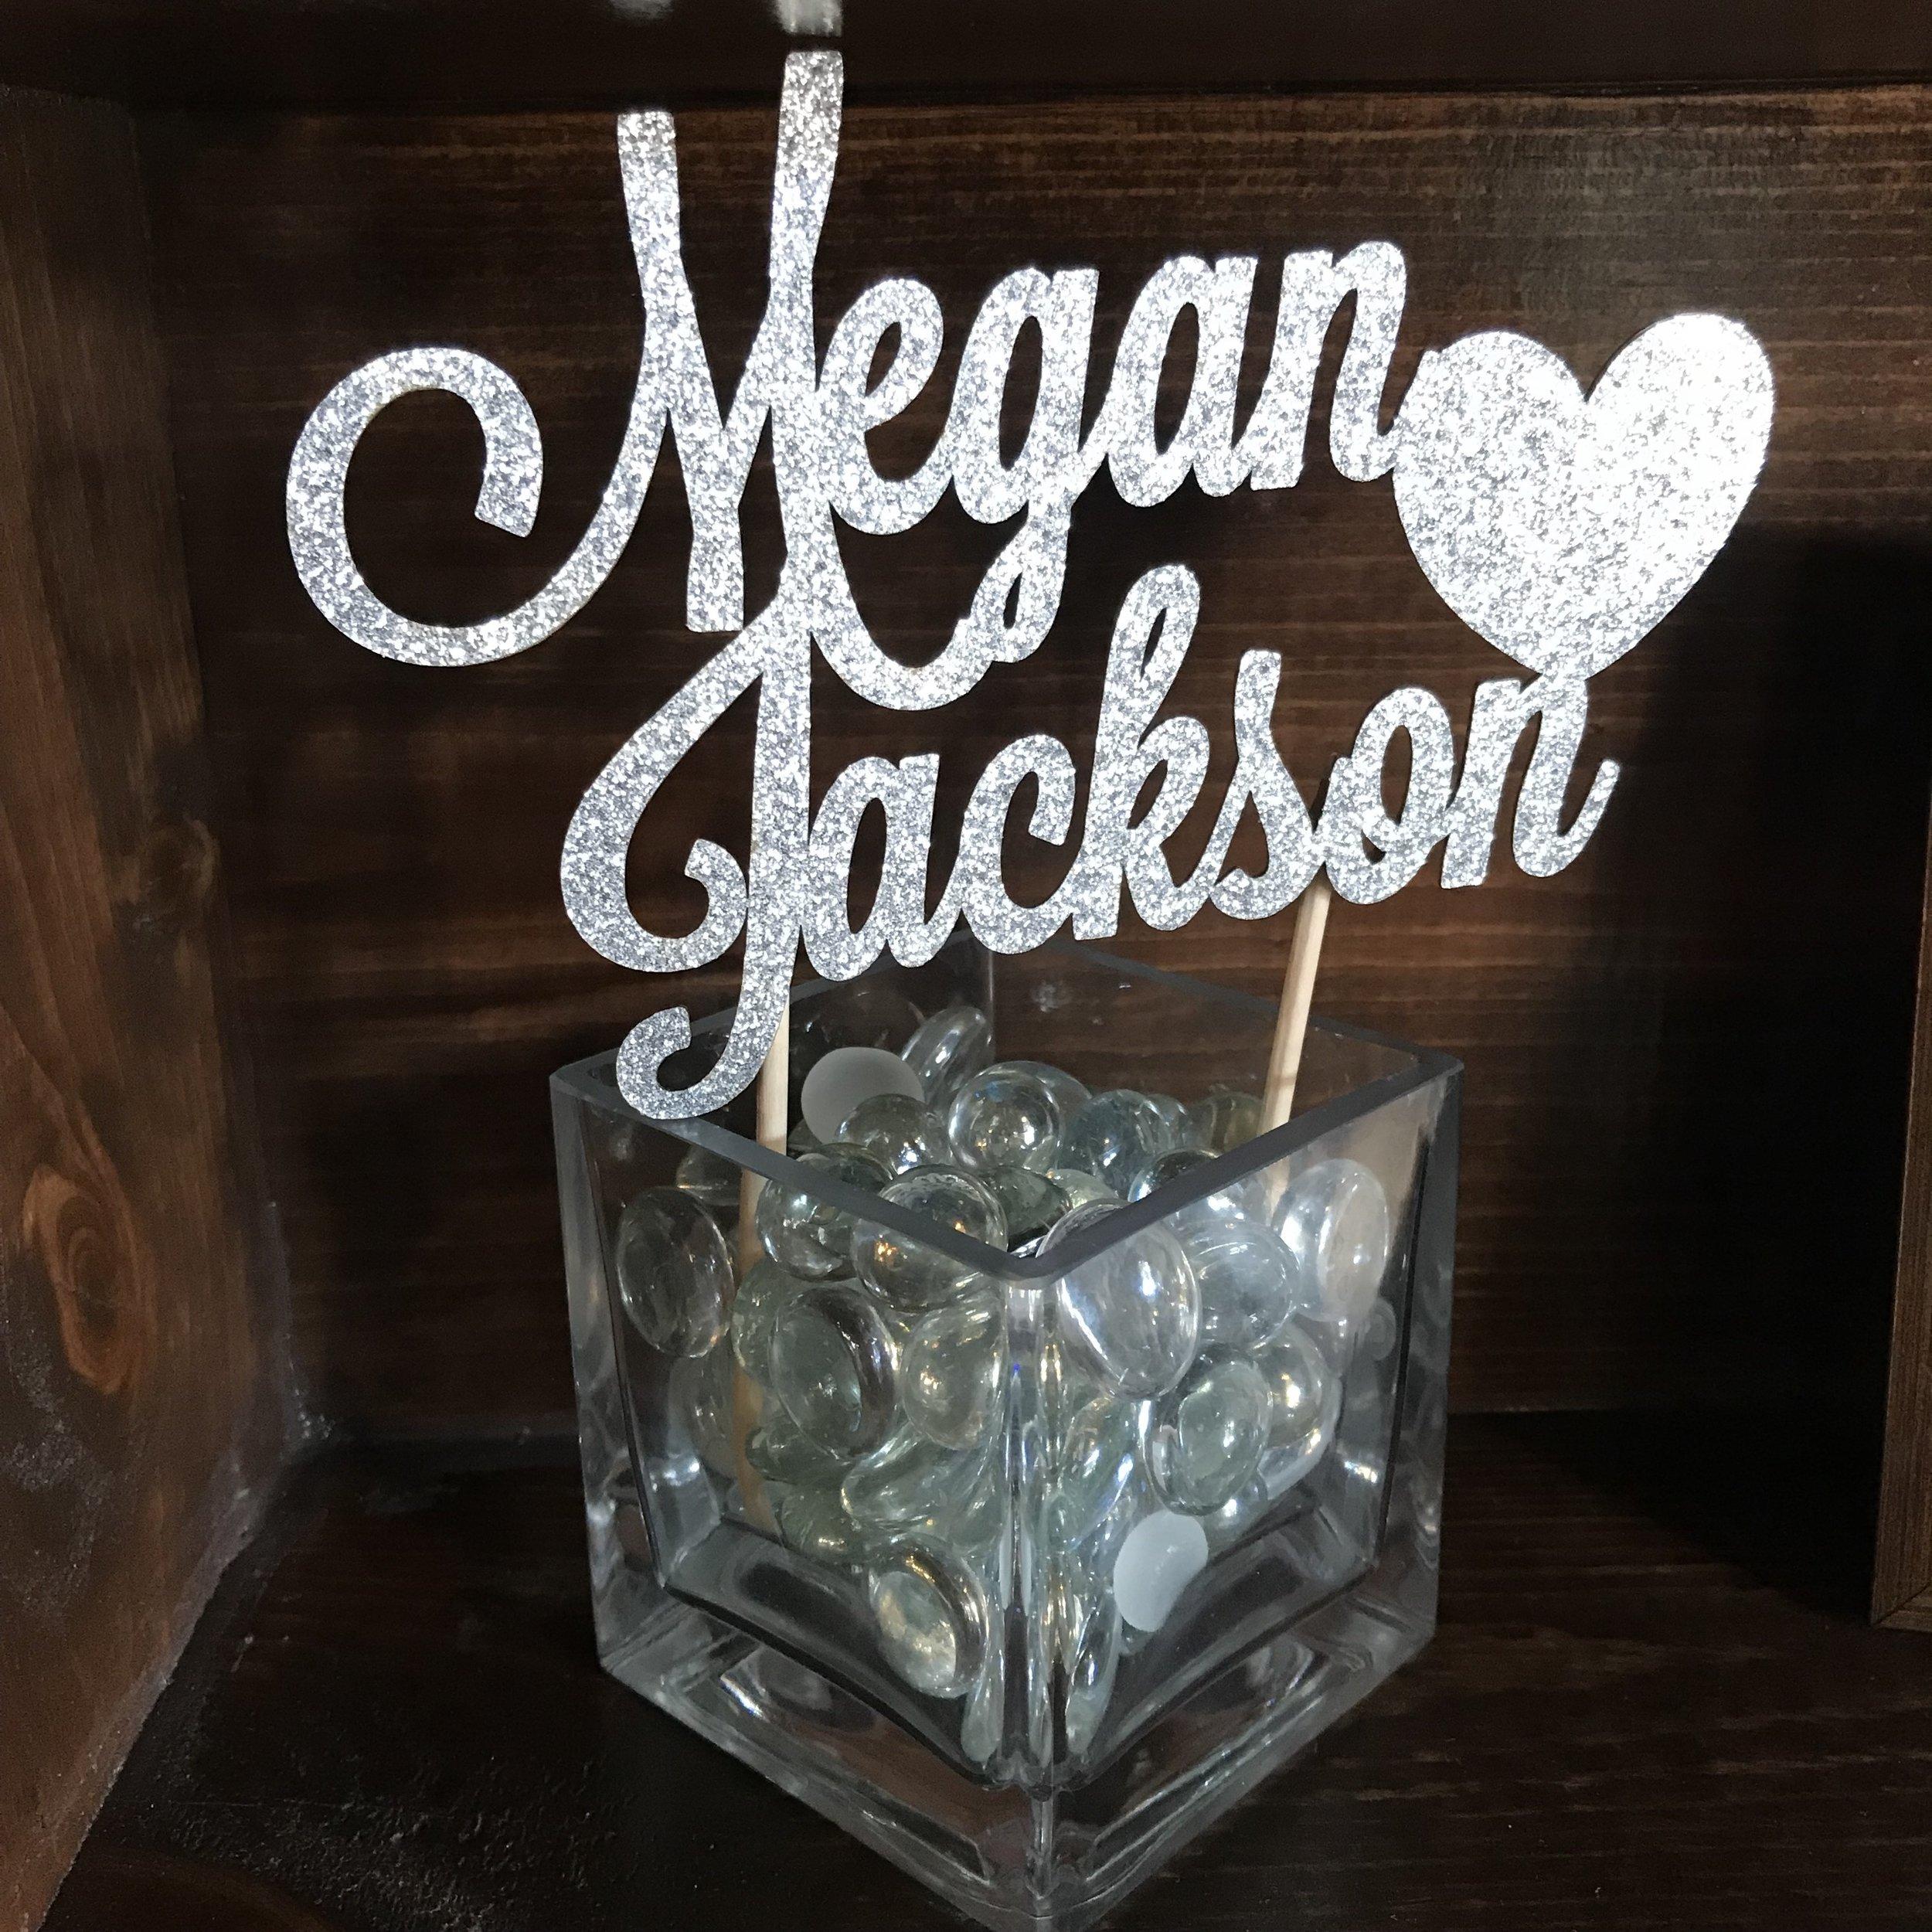 Megan & Jackson sign by DJ Jim Cerone